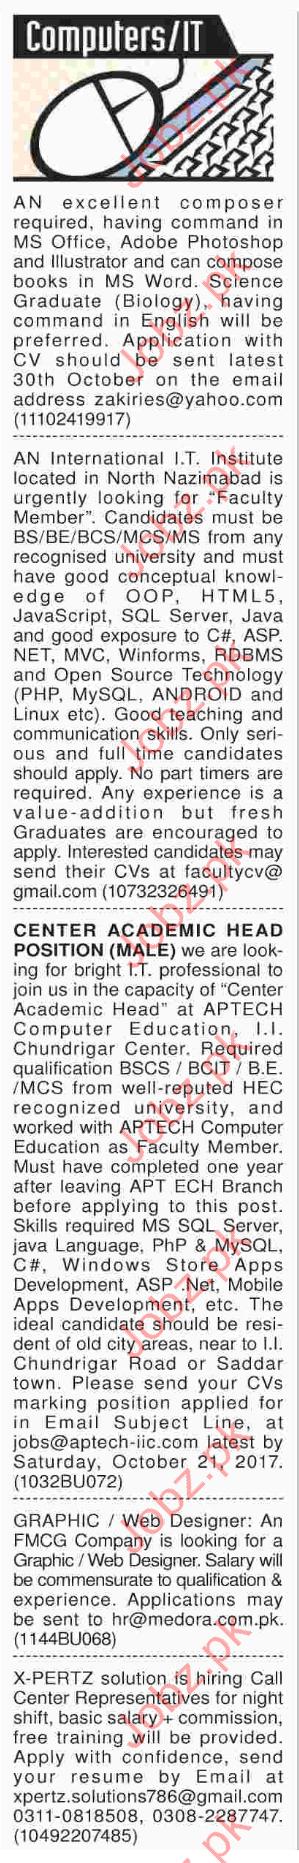 Computer/IT Officer Job Opportunities